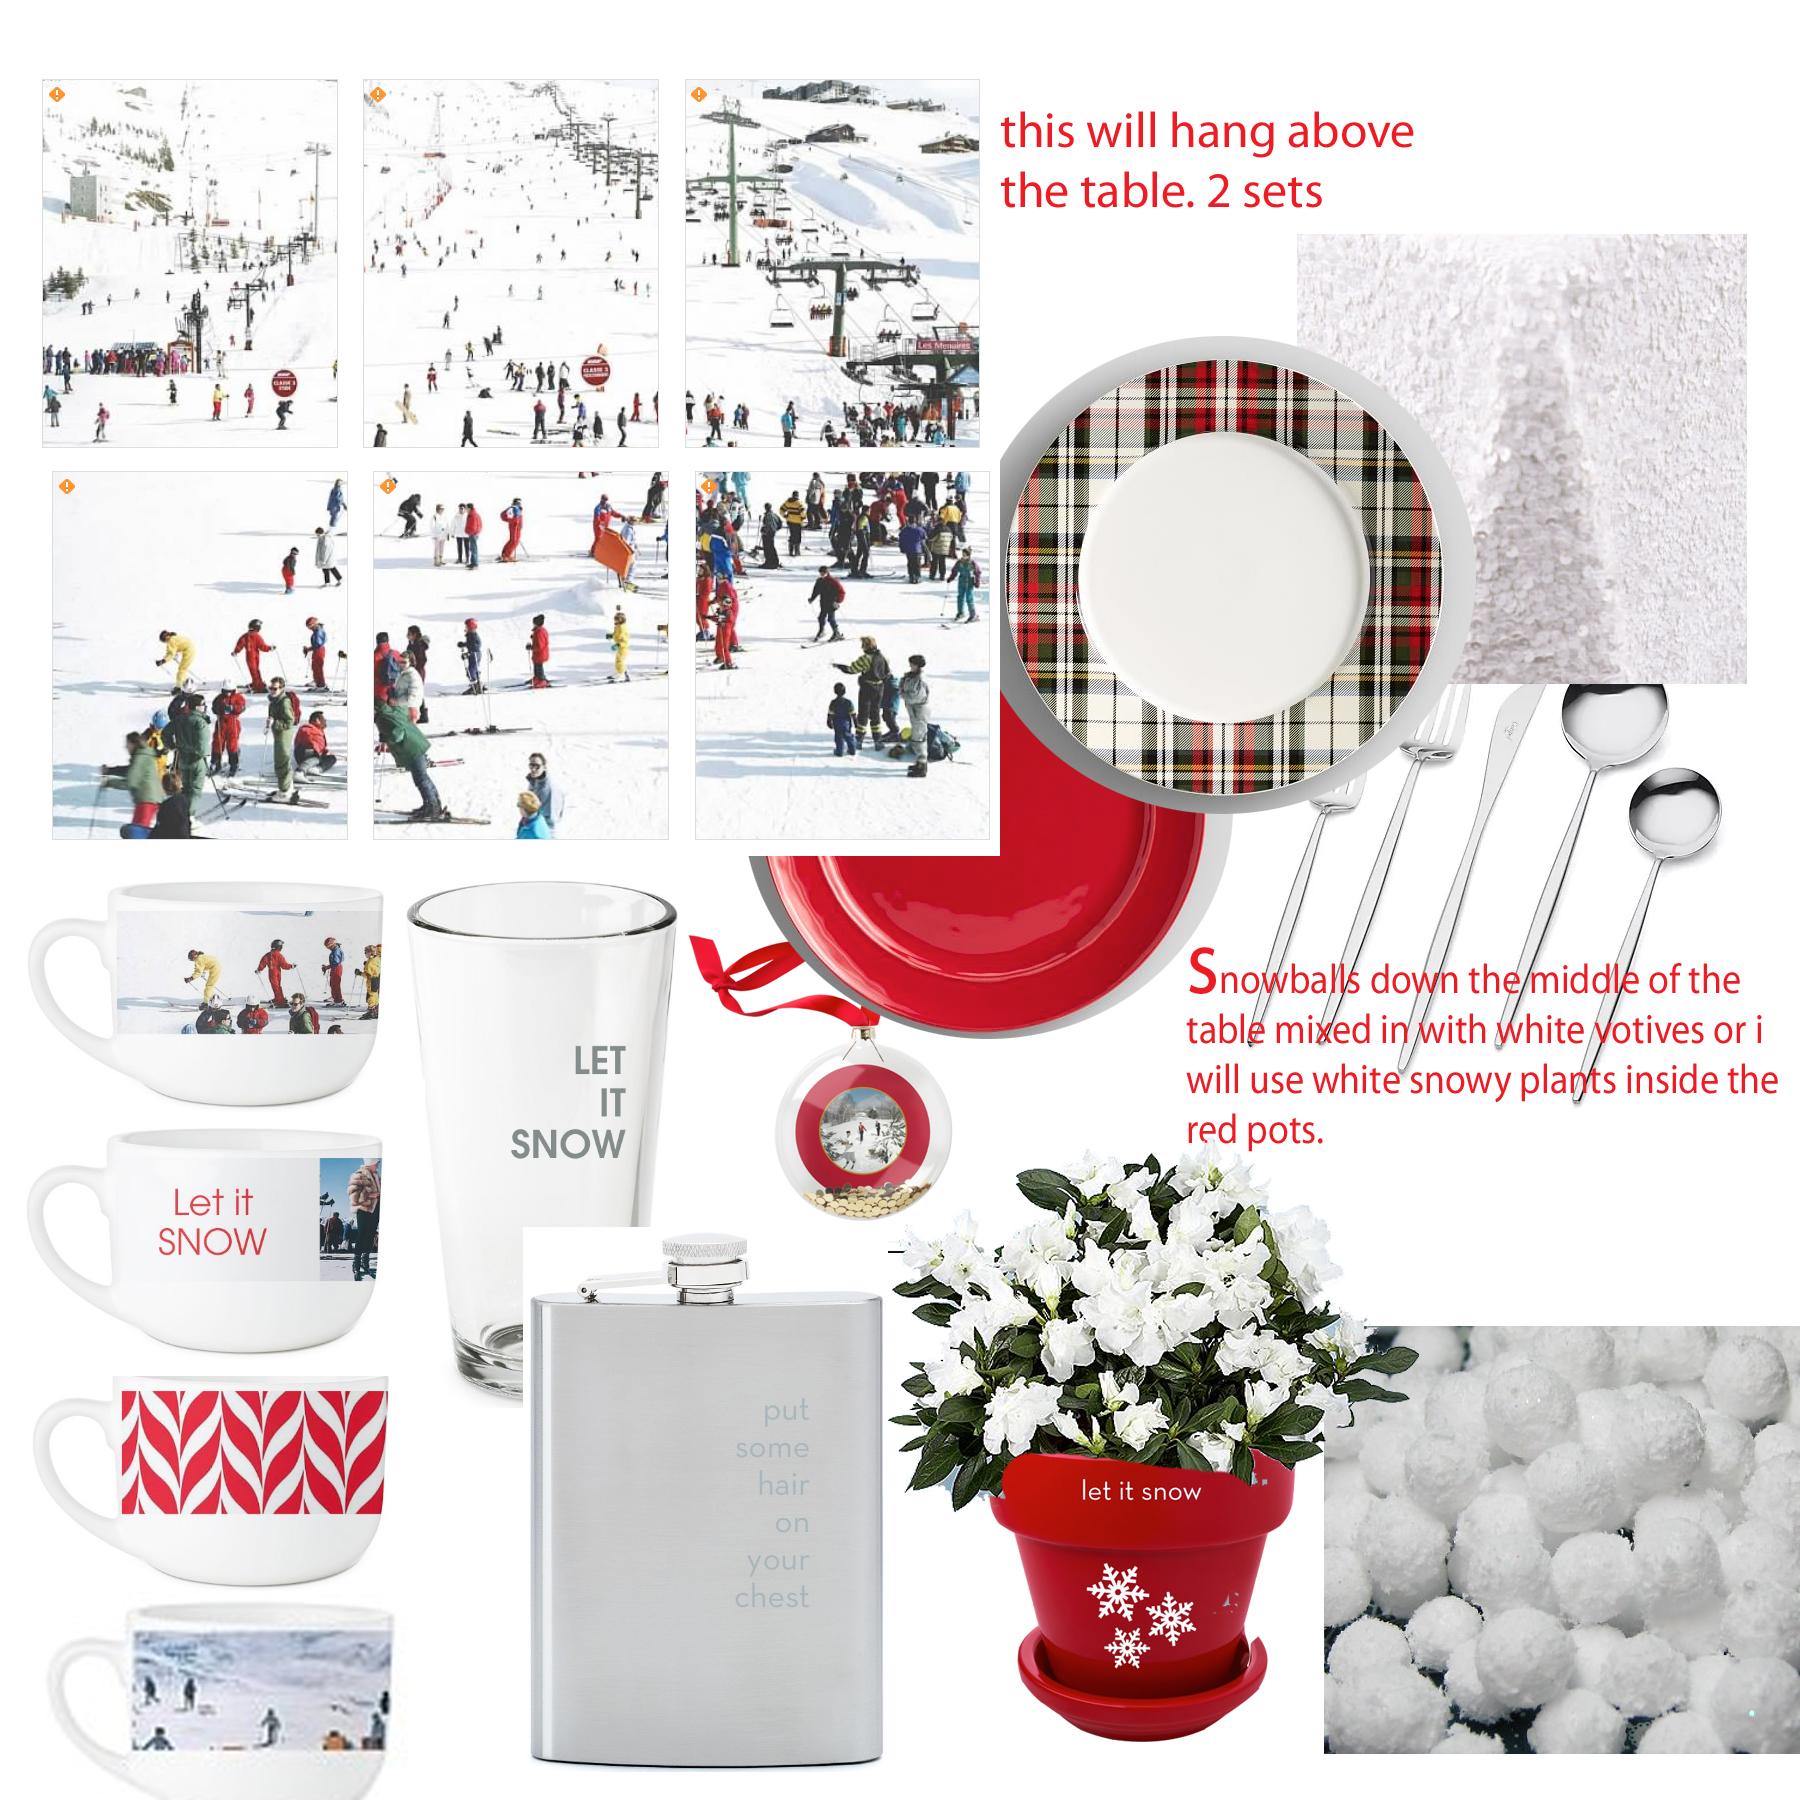 snowy table.jpg